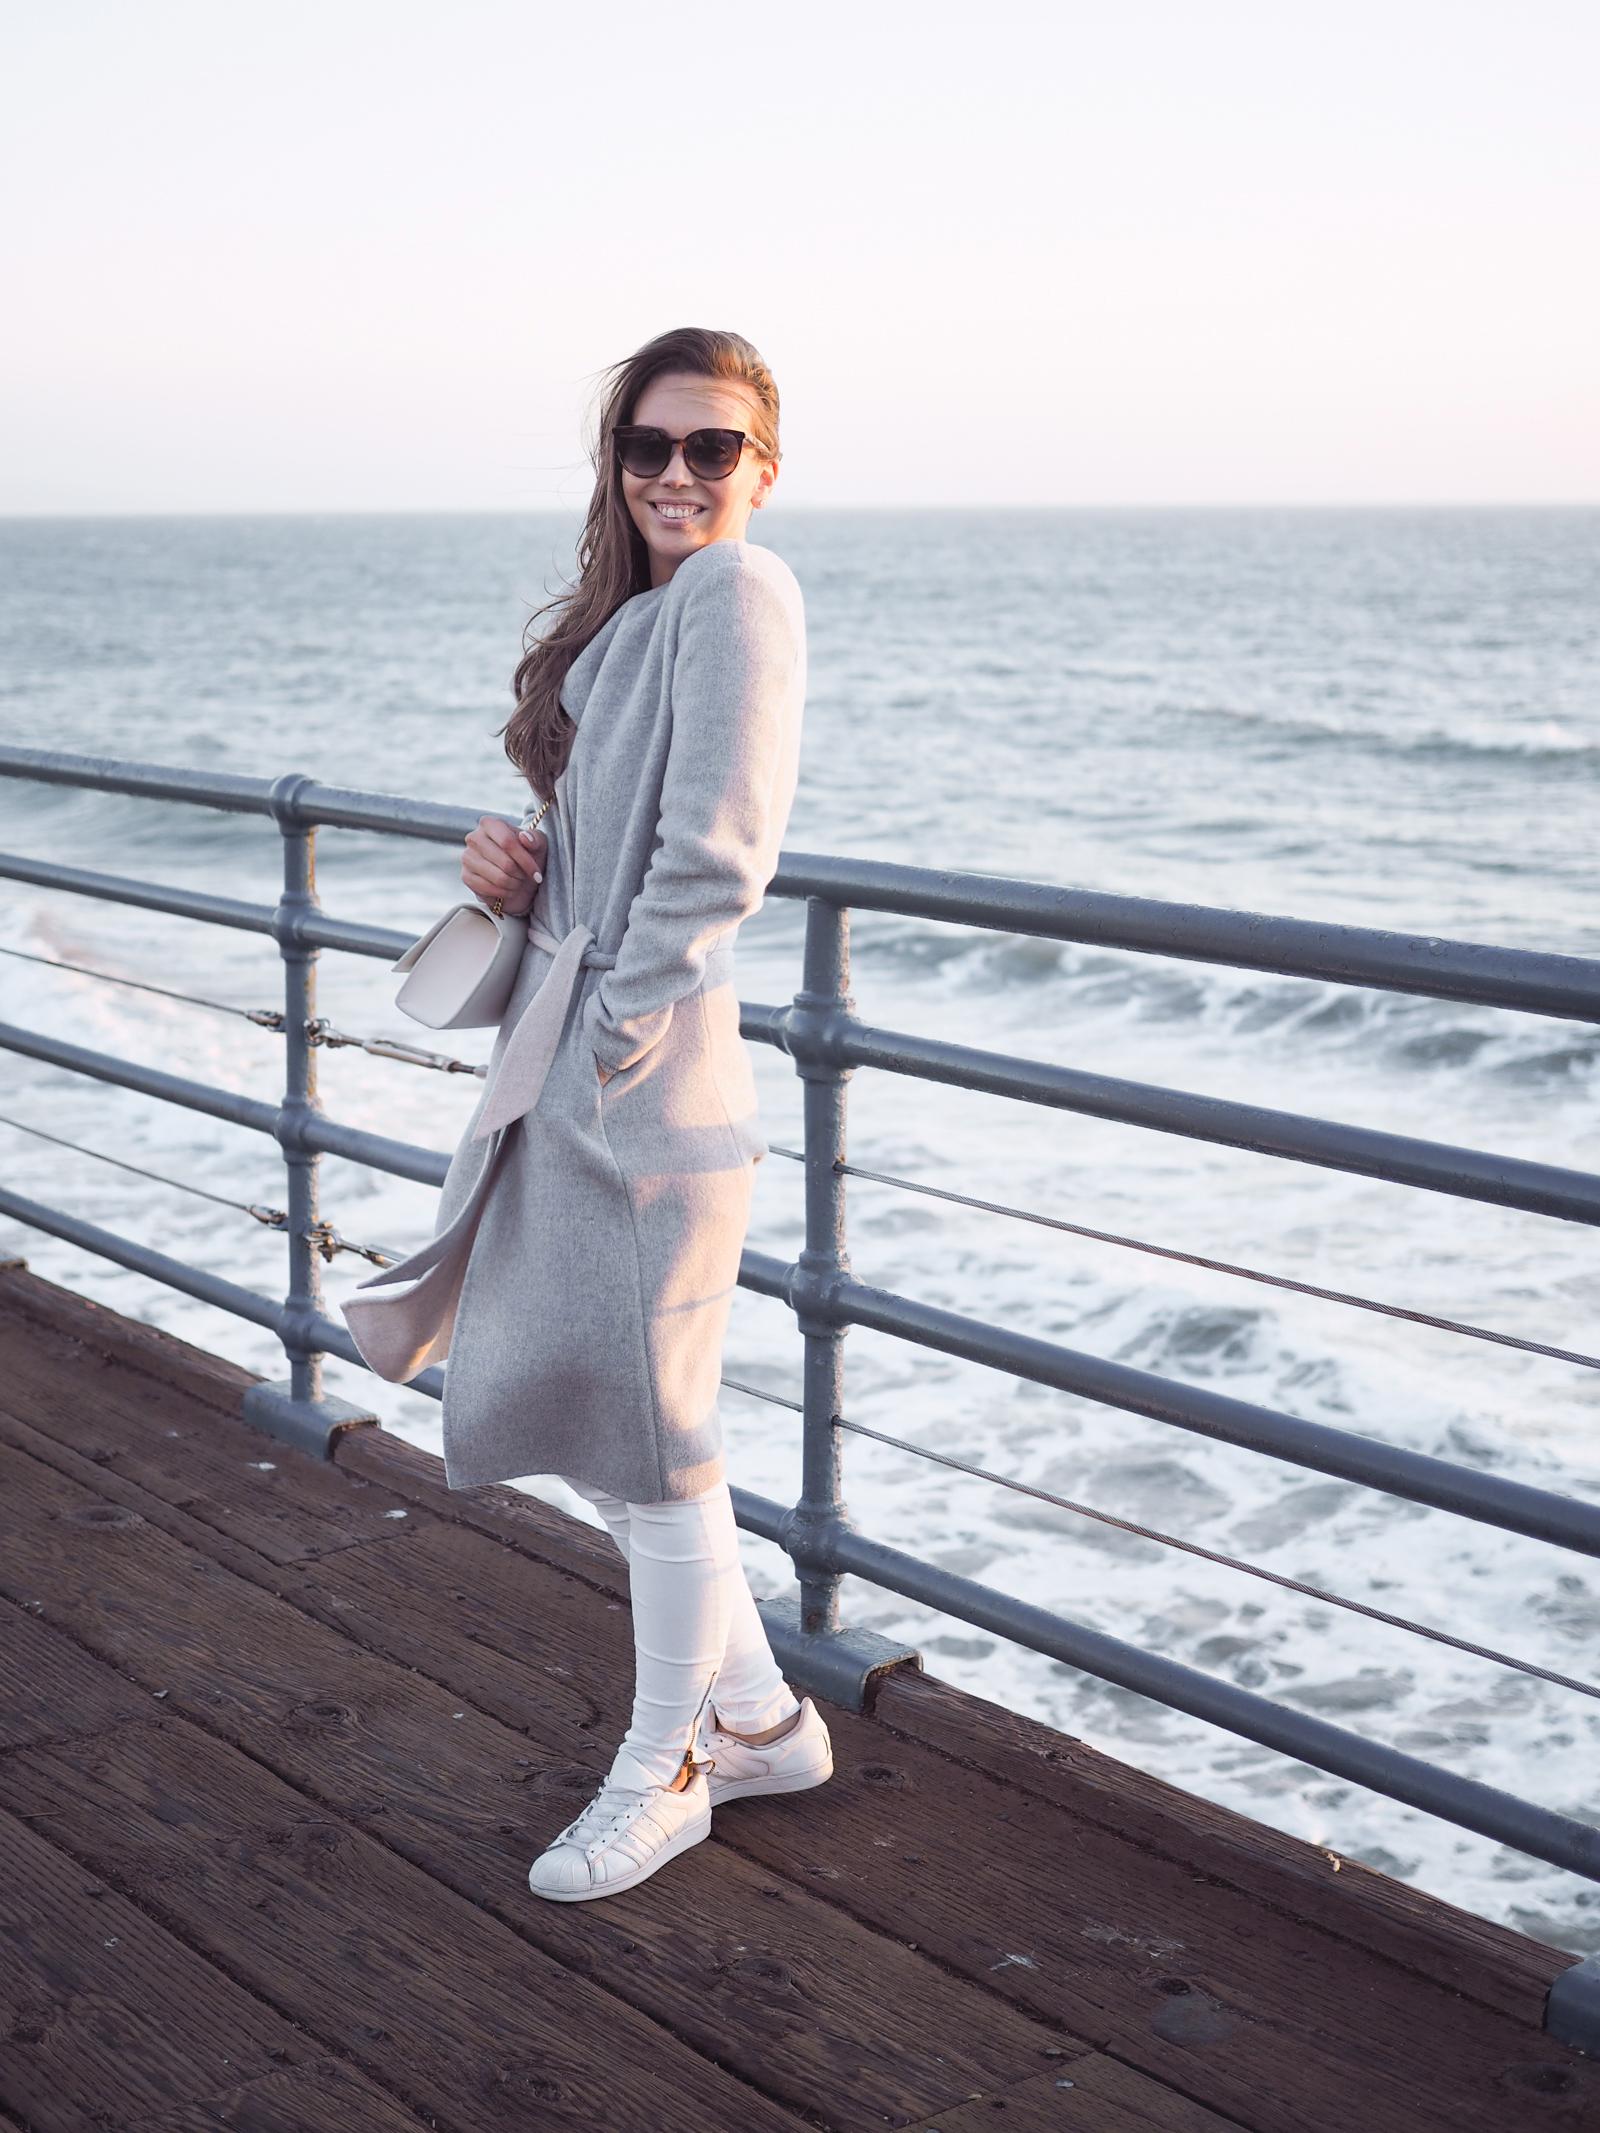 santa monica pier outfit metti-1230898